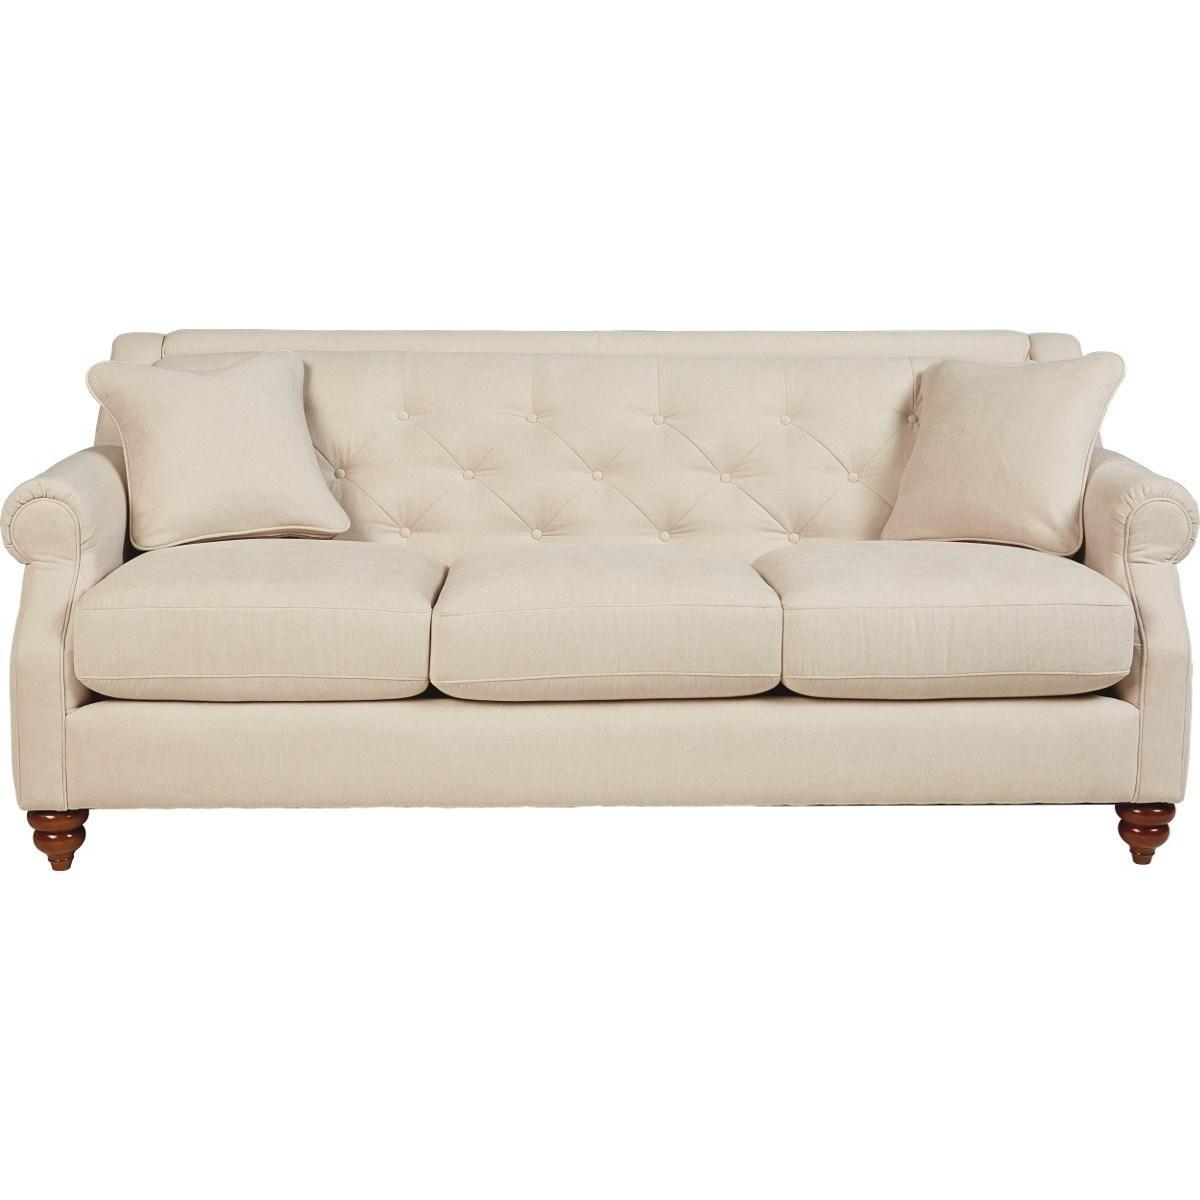 Aberdeen Sofa by La-Z-Boy at Factory Direct Furniture